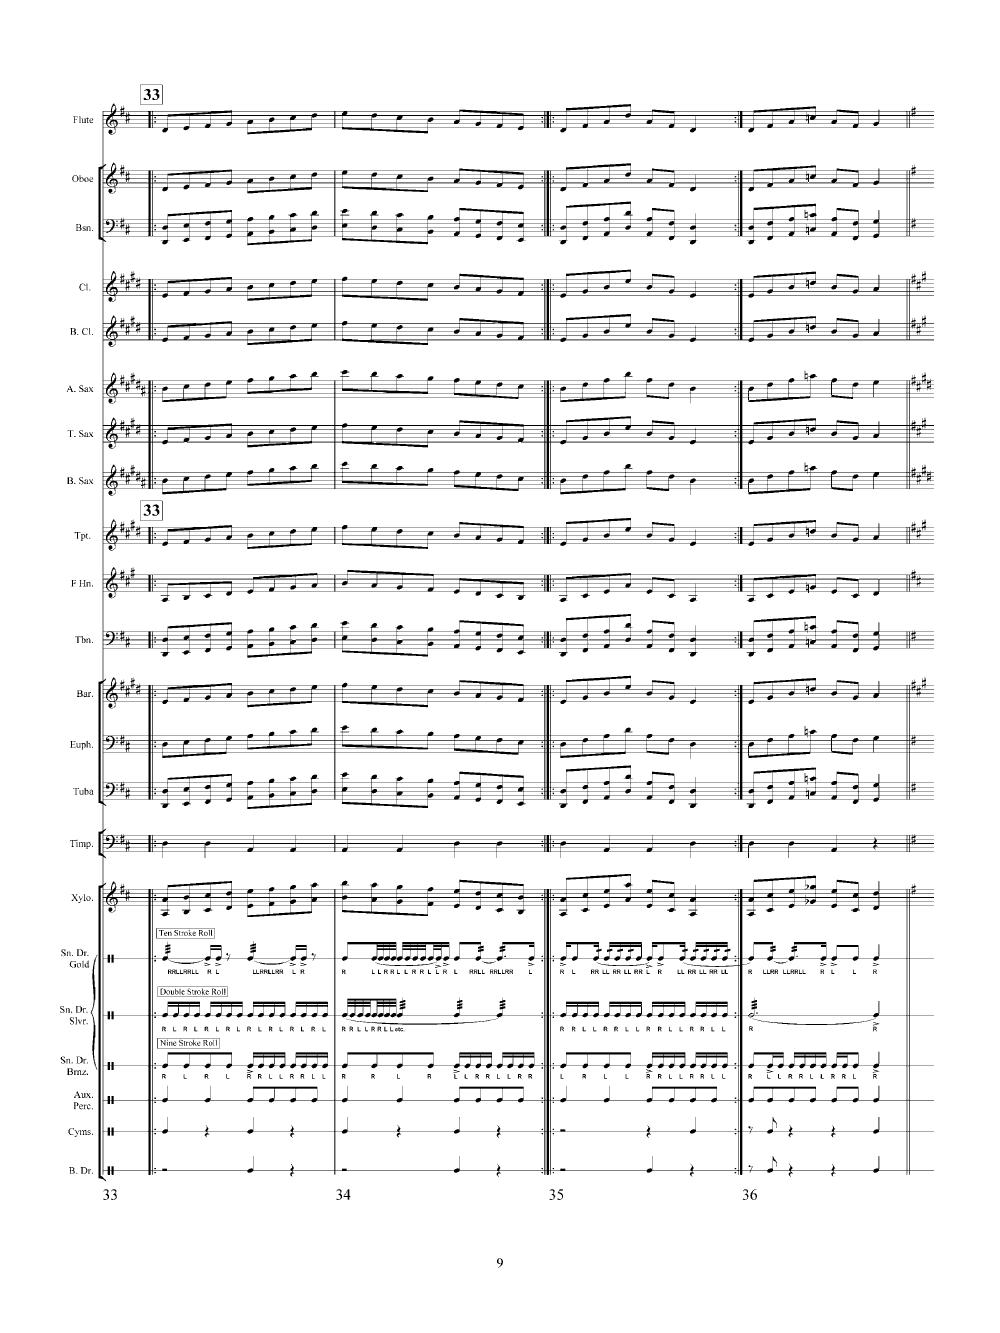 12 Major Scales And Arpeggios